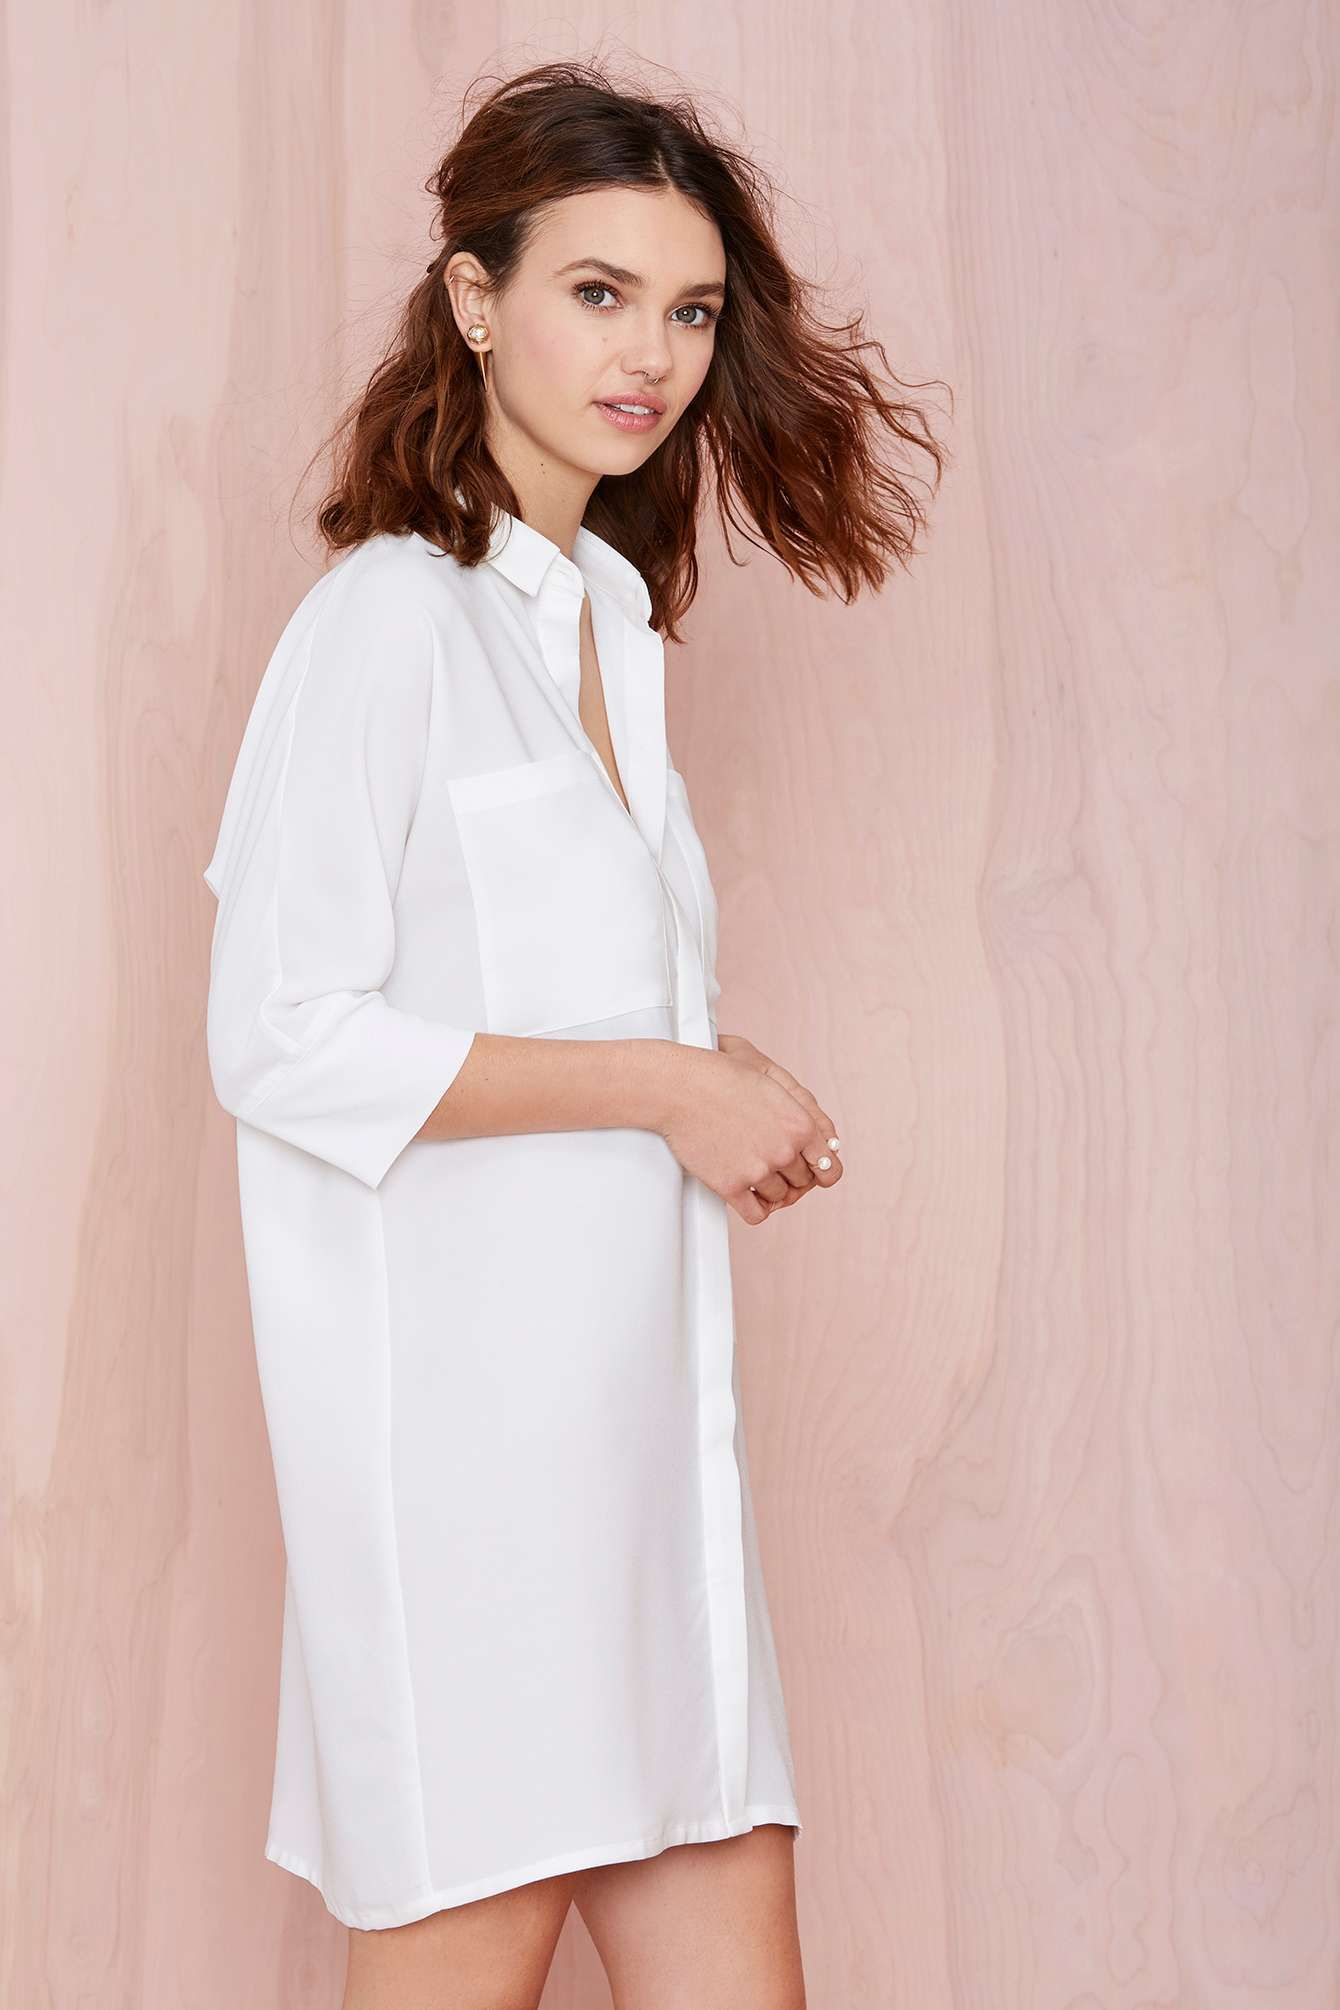 Simple.   Things to Wear   Pinterest   Moda mujer y Vestiditos